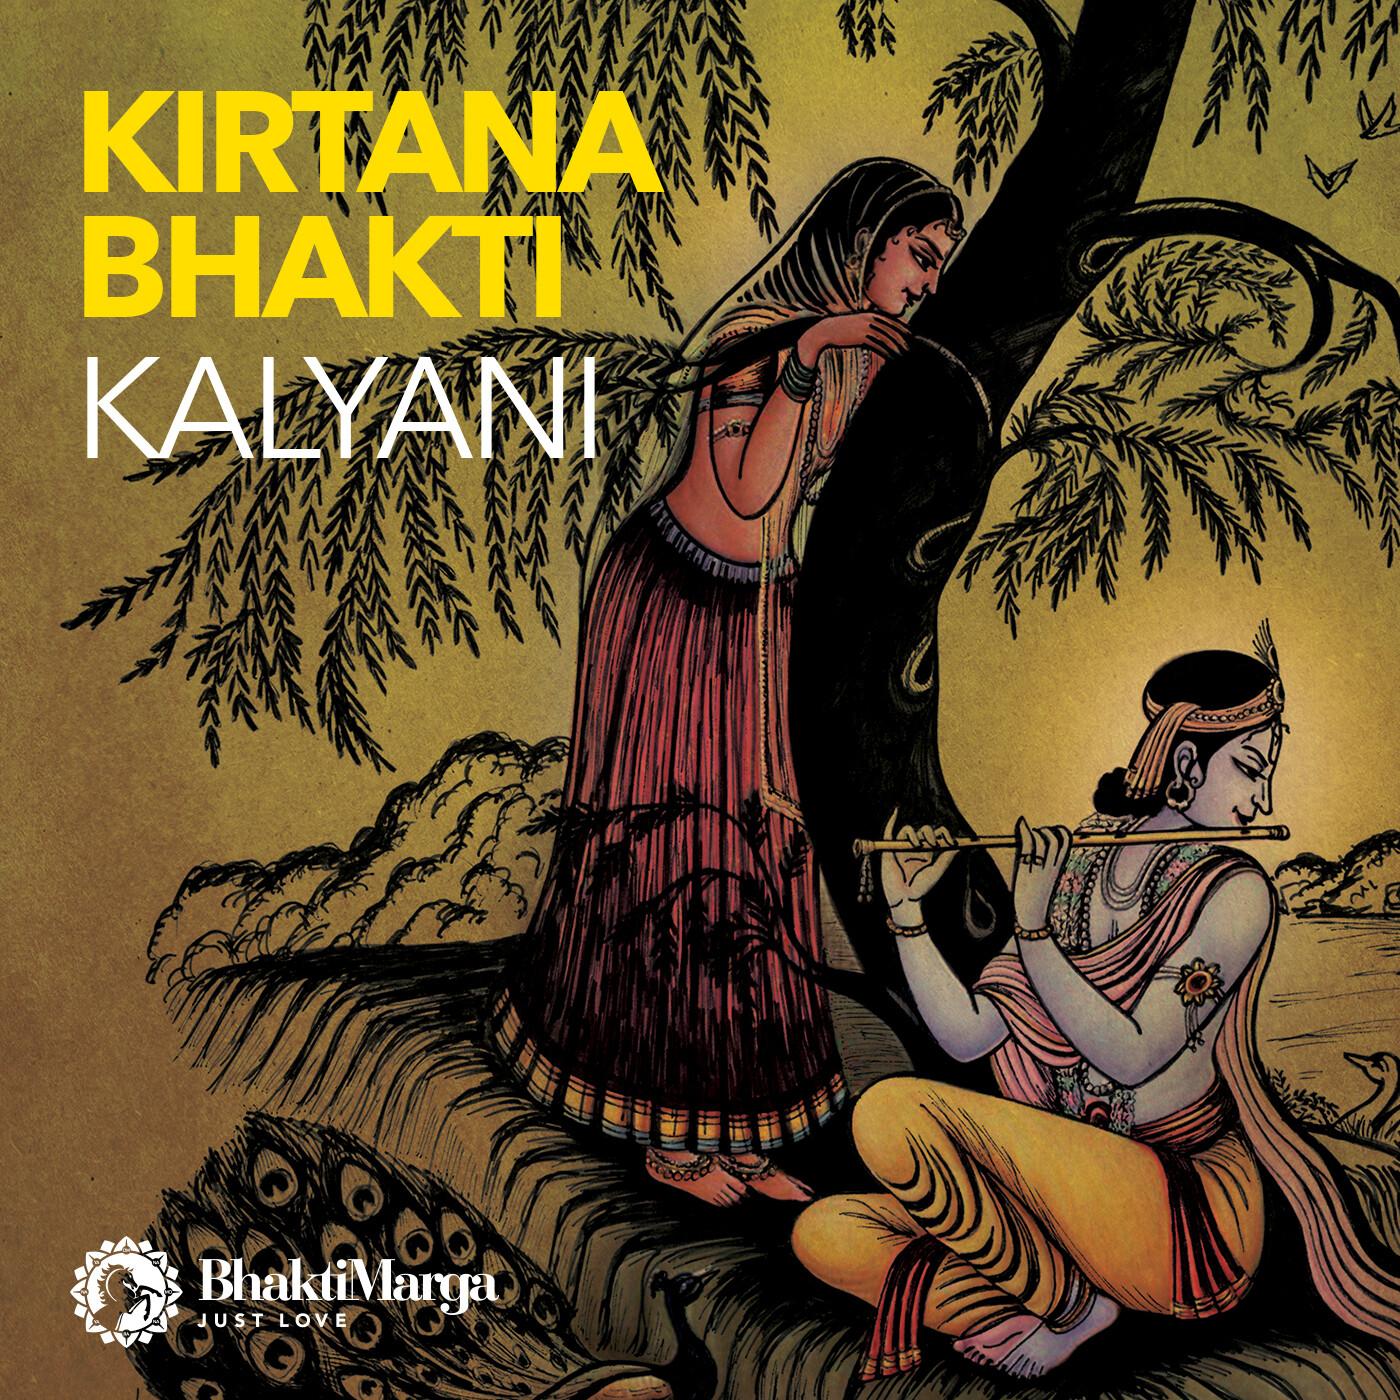 Kalyani: Kirtana Bhakti